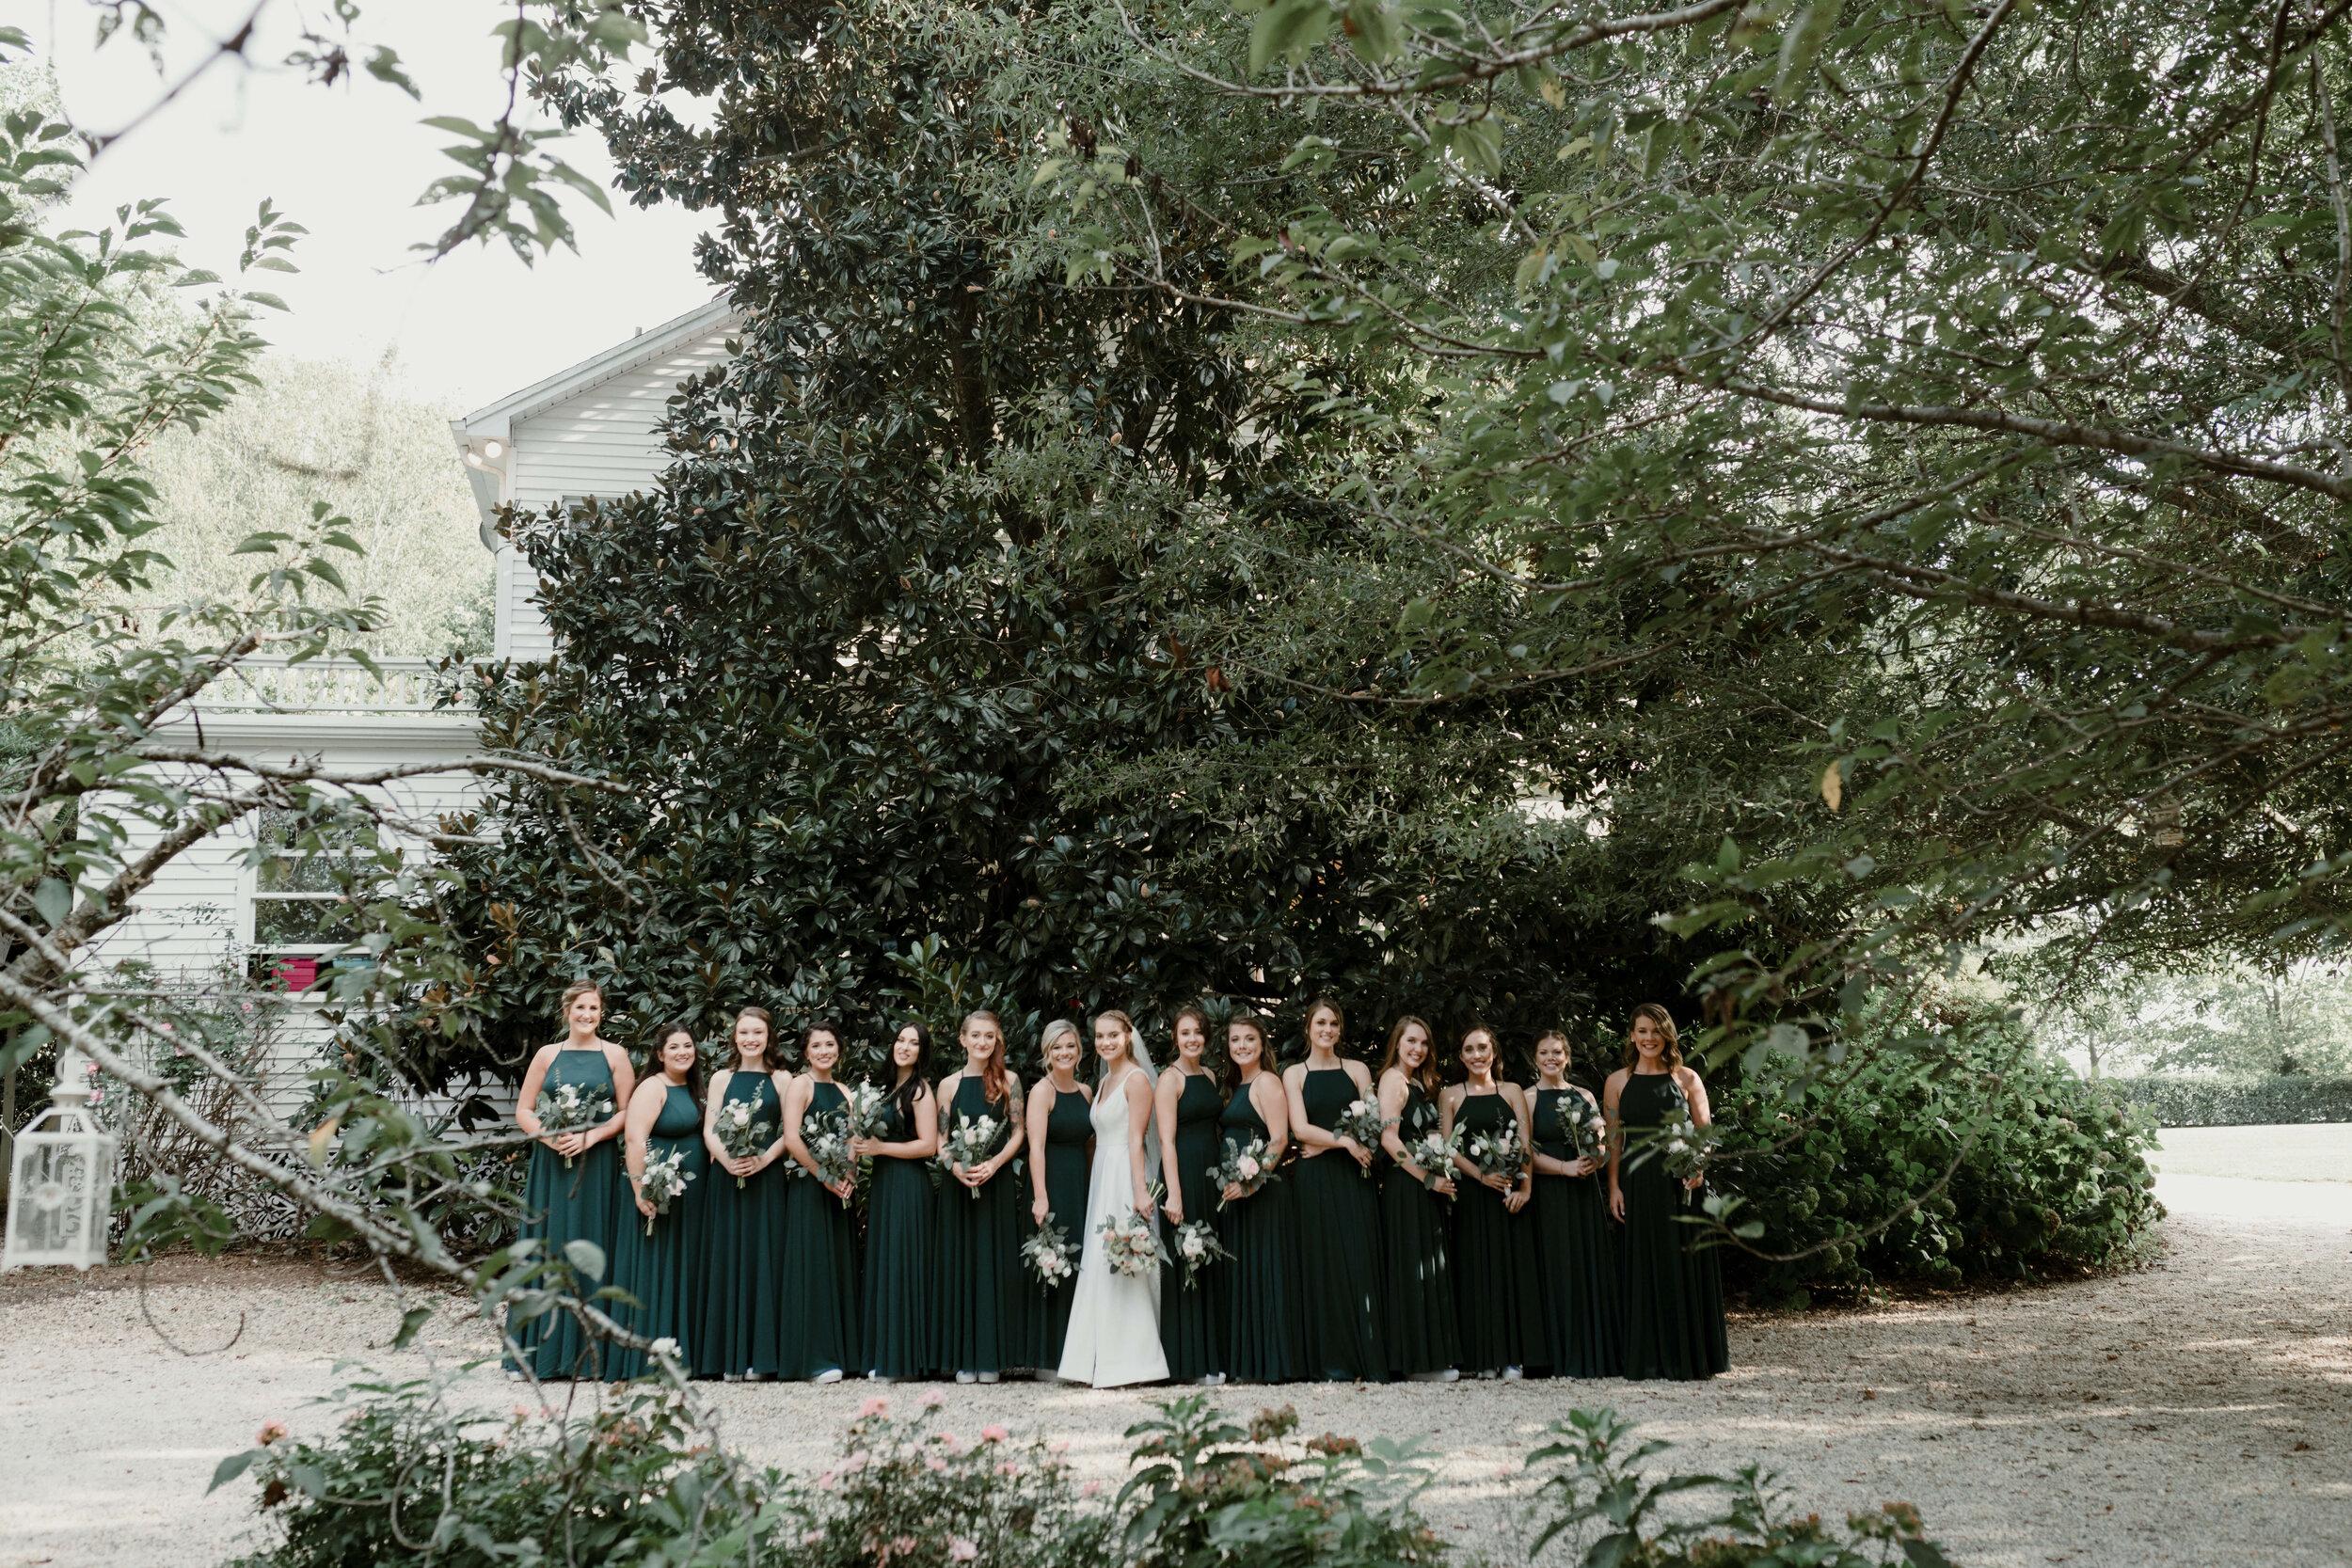 RALEIGH_WEDDING_GABBY_AND_SMITTYDSC_1865.jpg